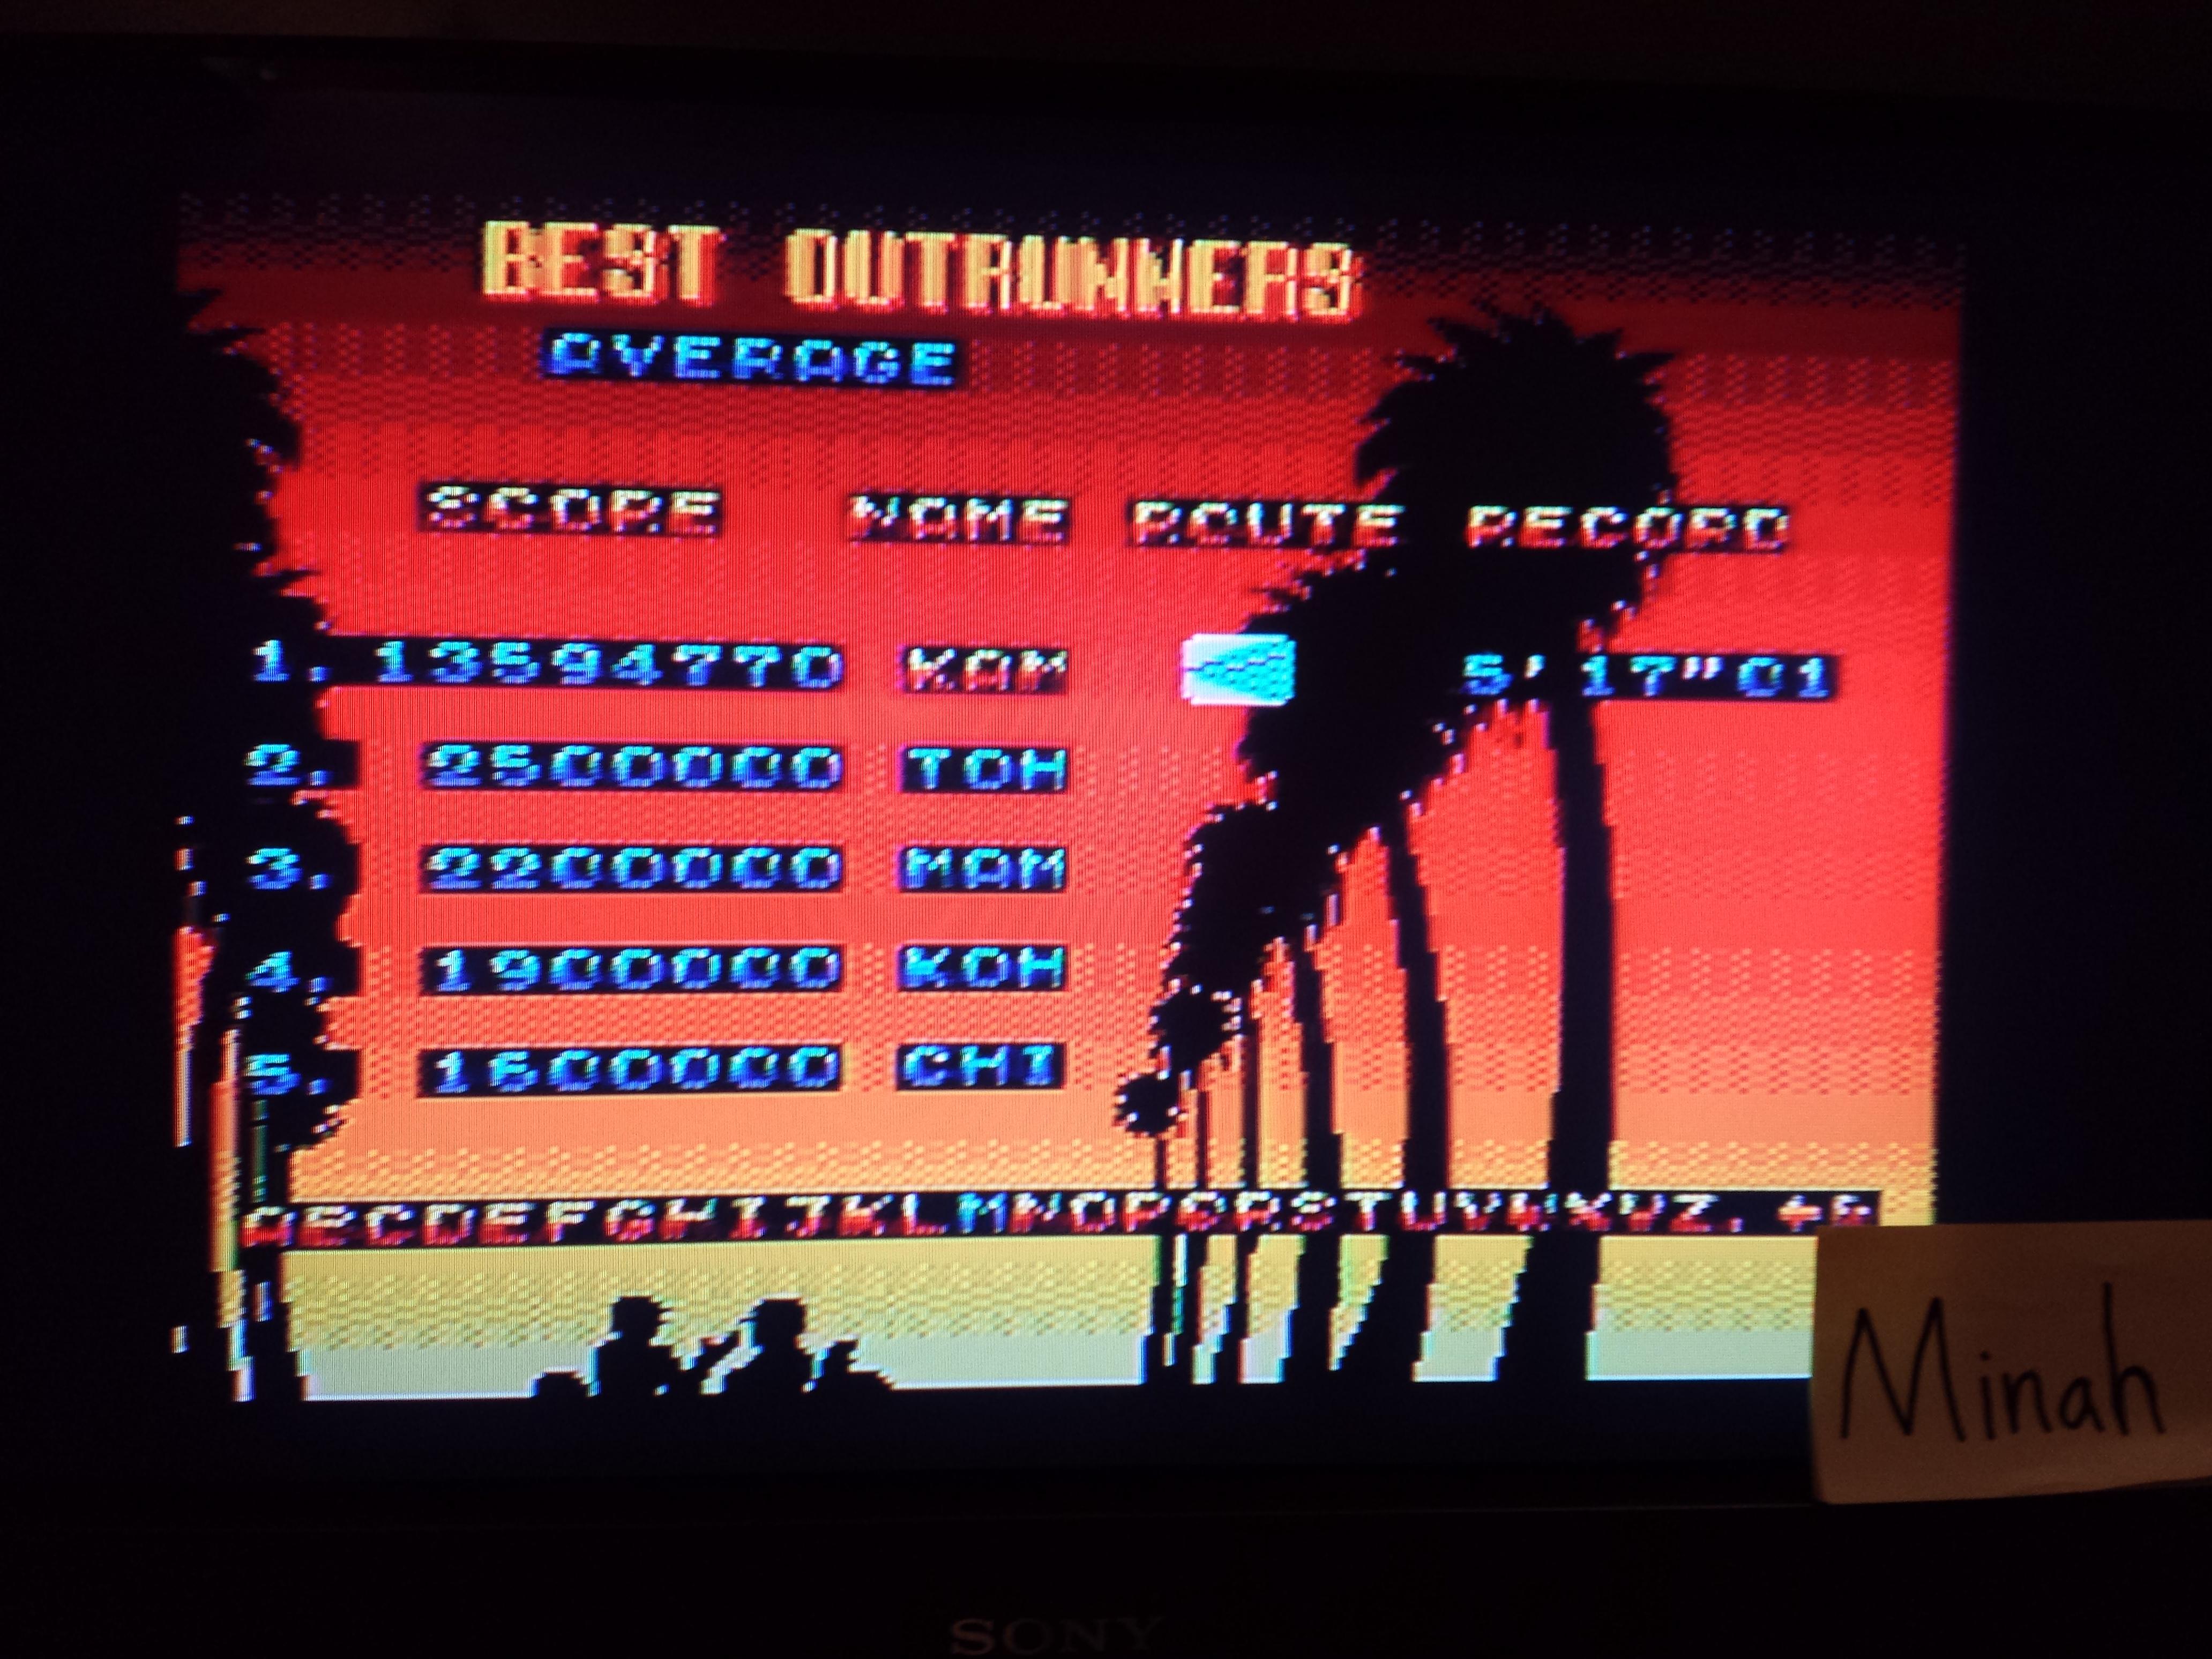 Outrun 3D 13,594,770 points